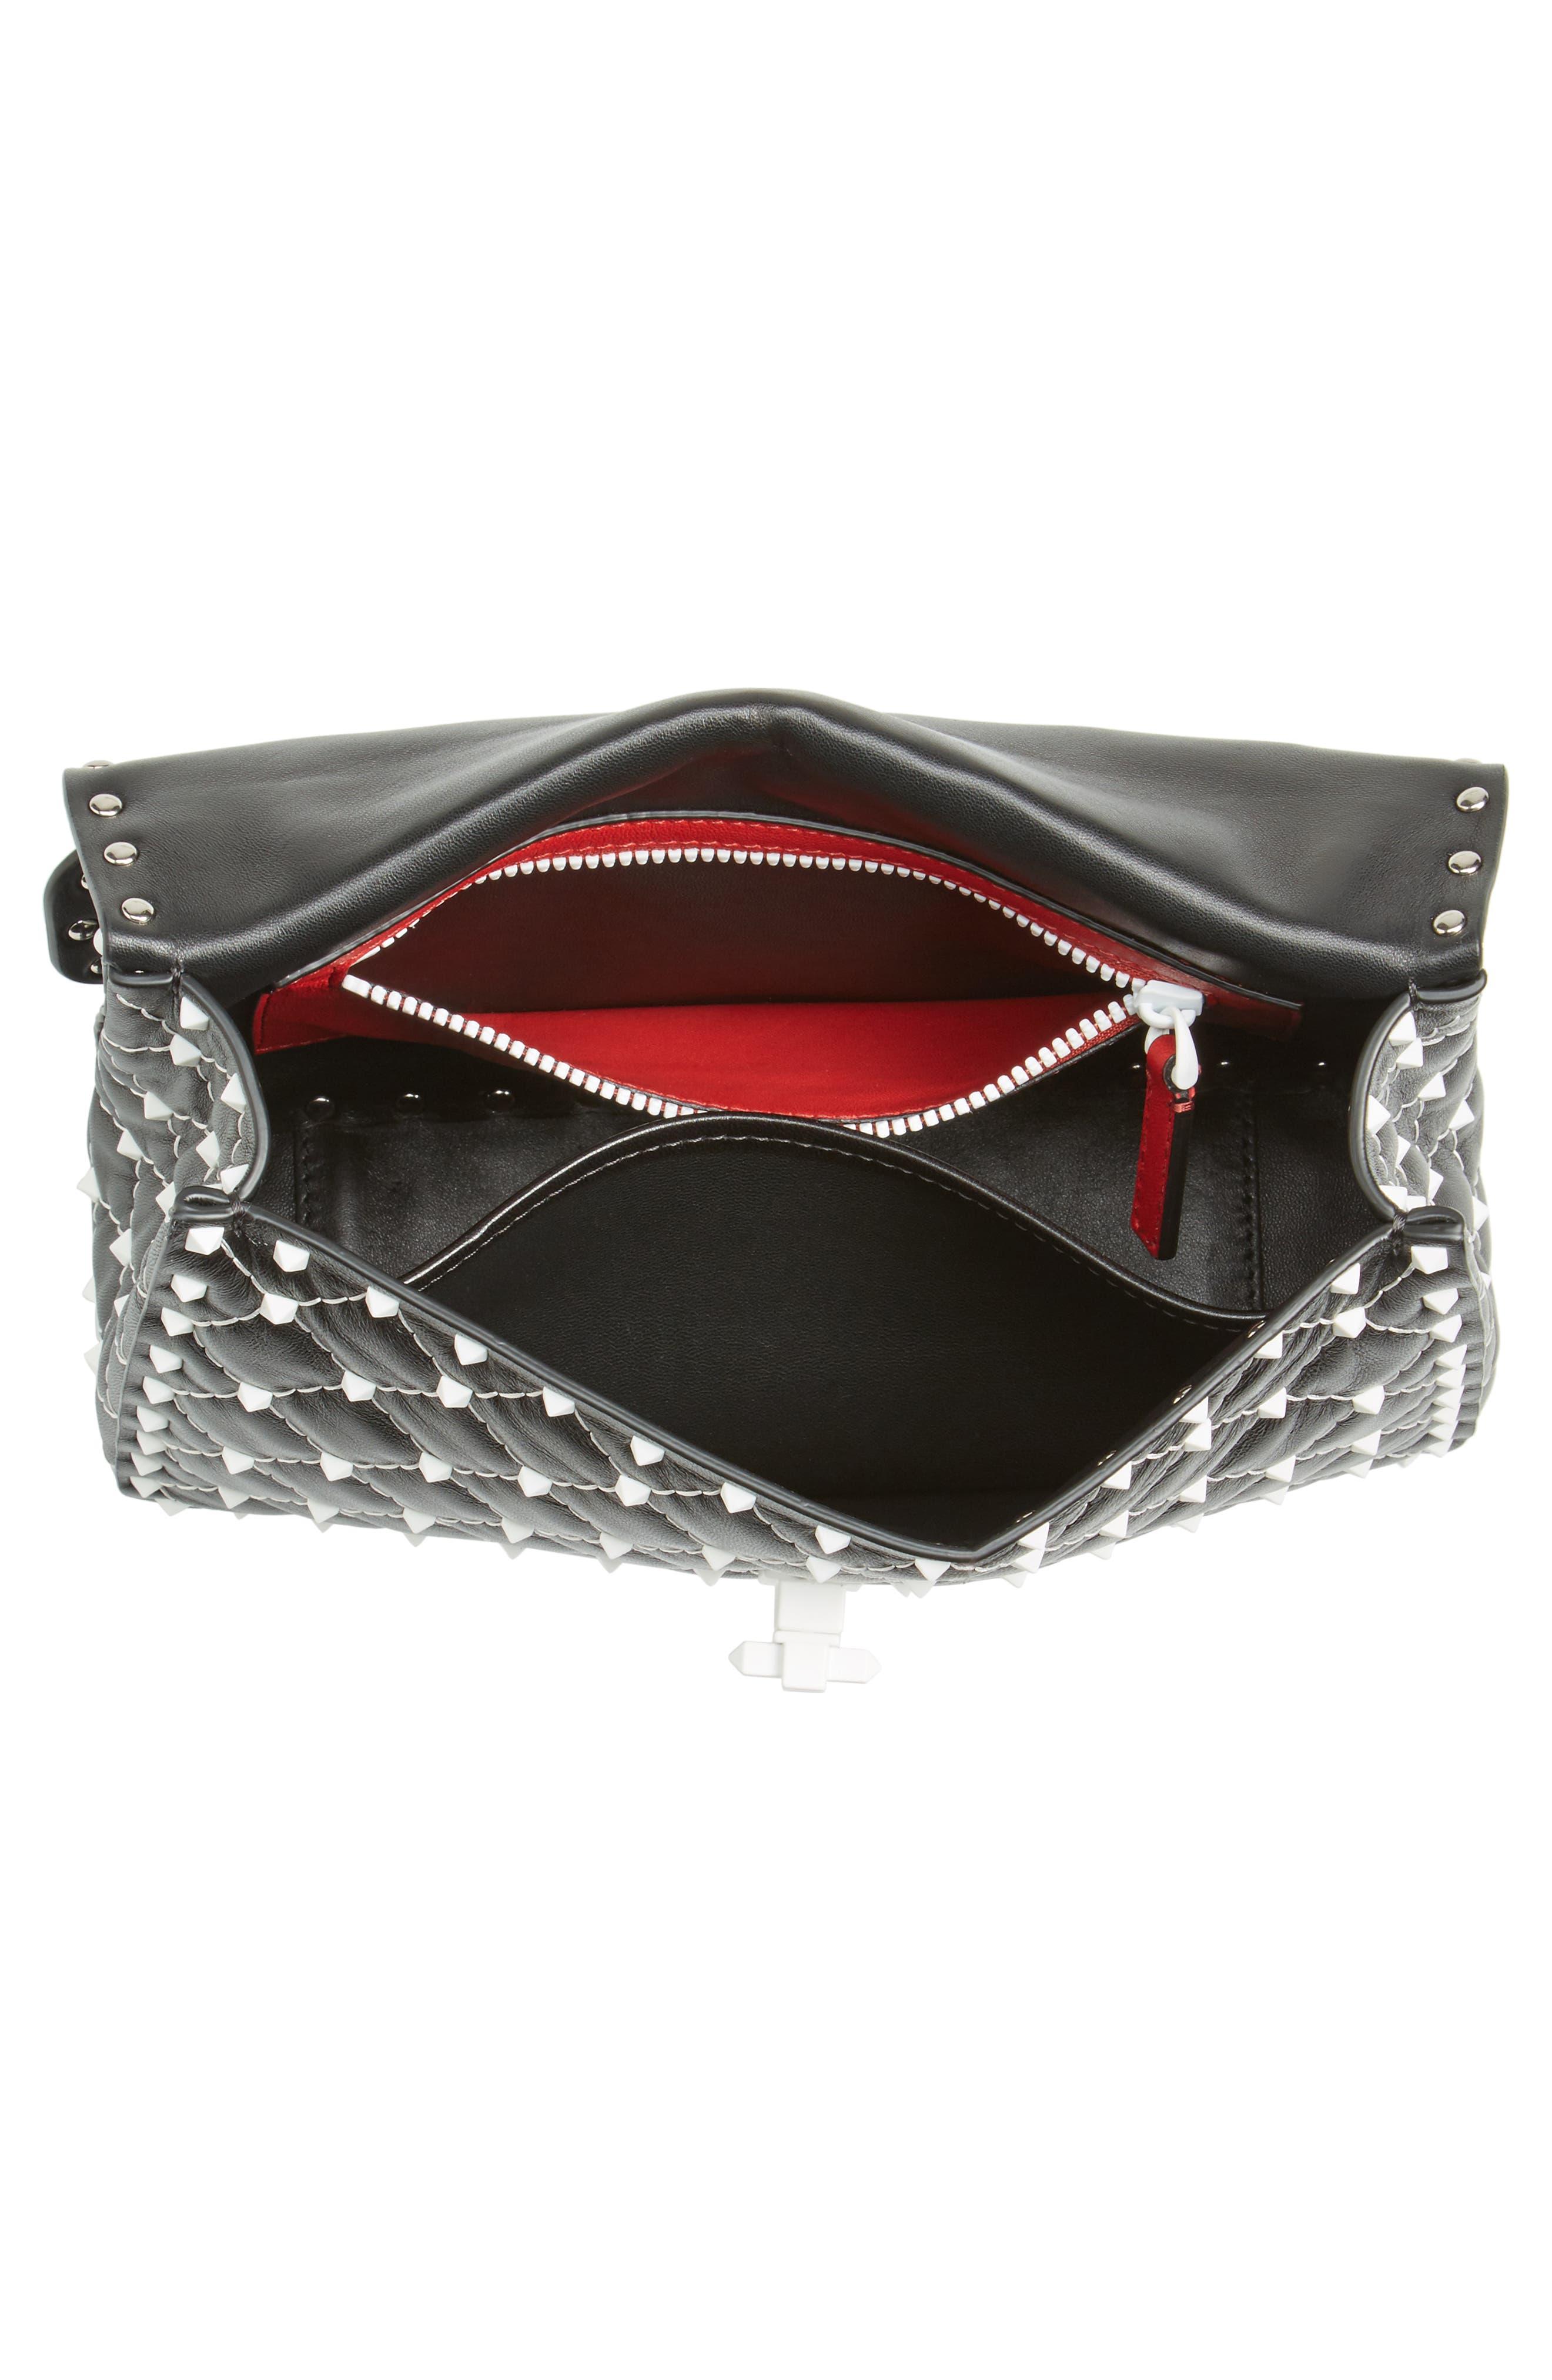 Medium Rockstud Matelassé Leather Shoulder Bag,                             Alternate thumbnail 10, color,